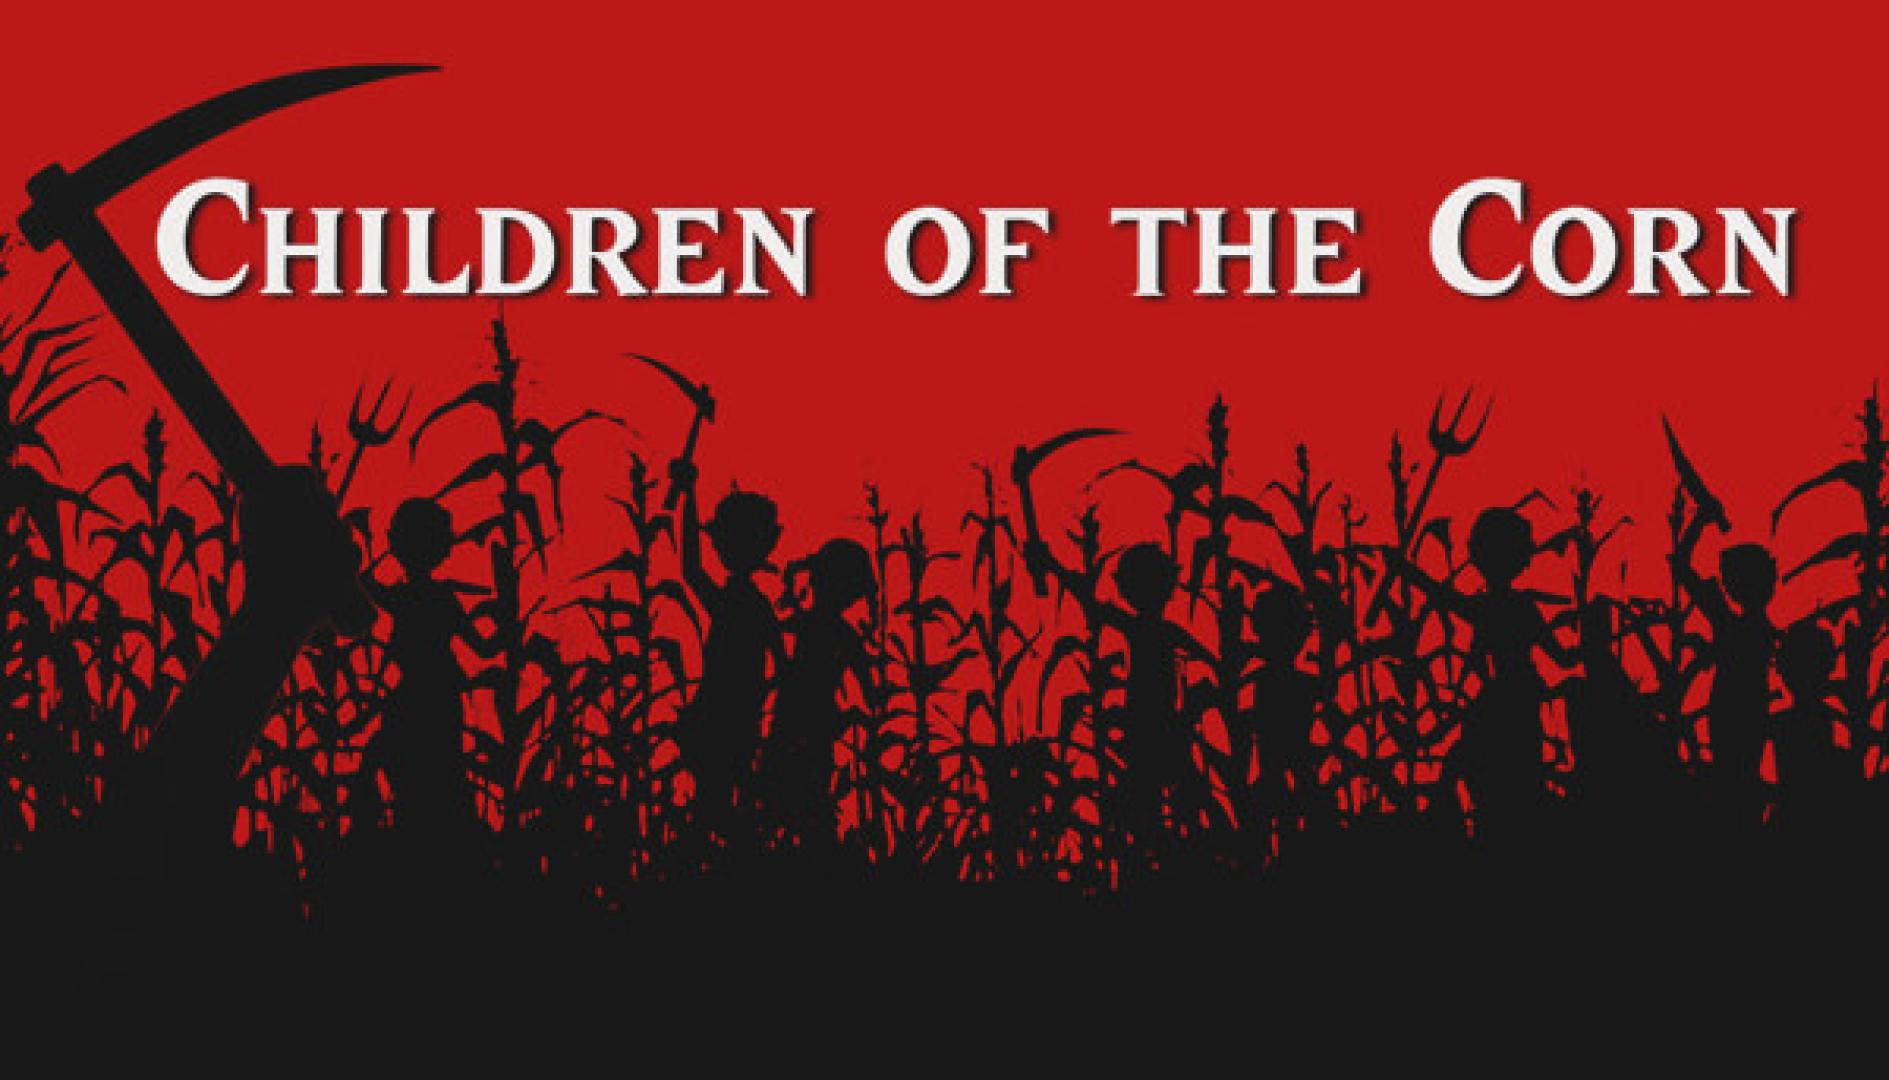 Children of the Corn - A kukorica gyermekei (1984)